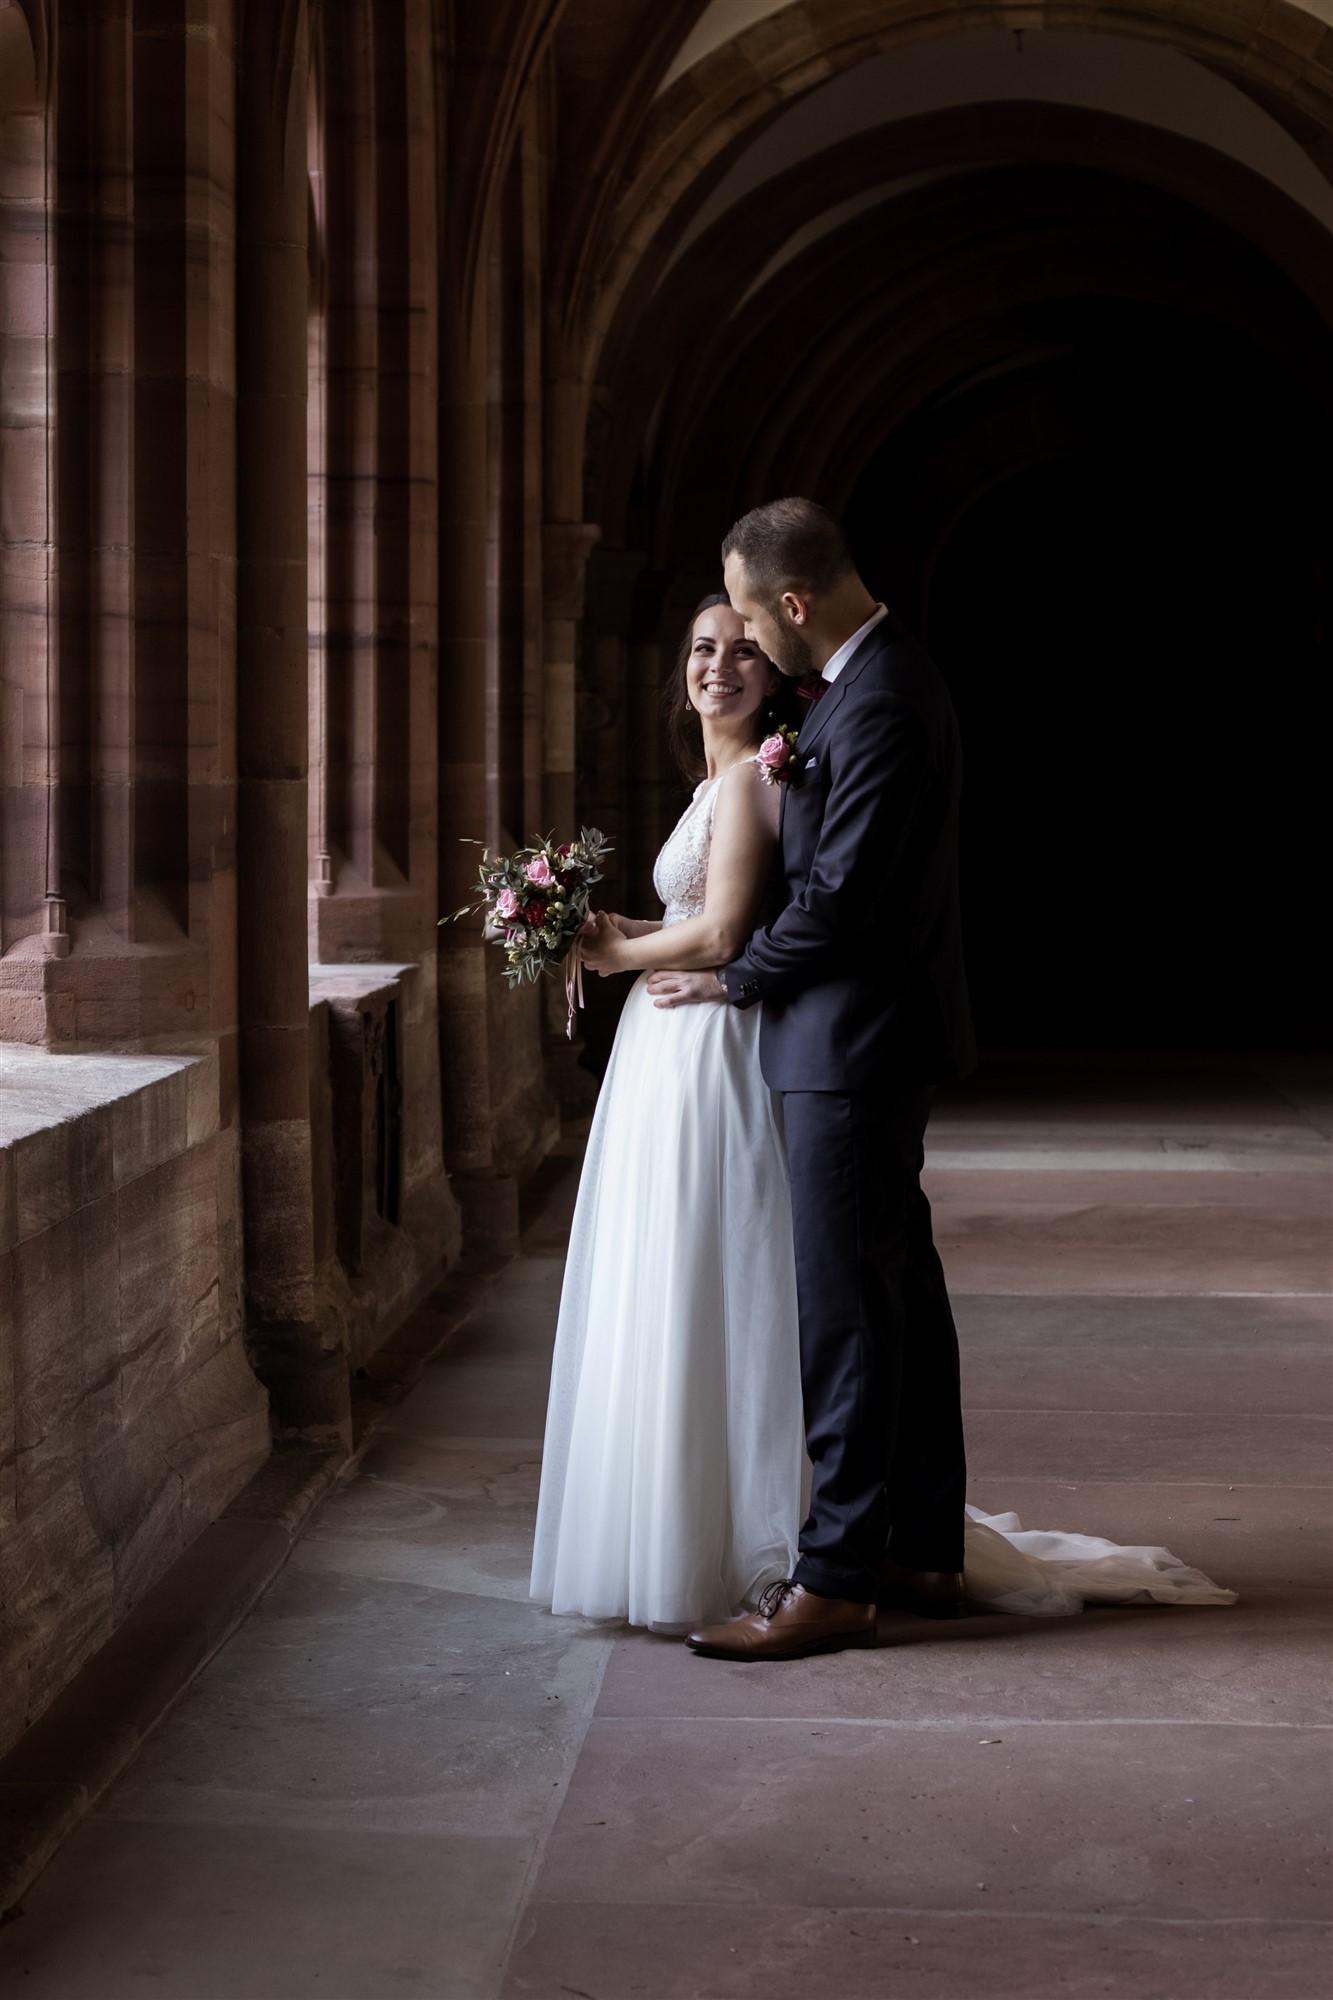 Brautpaar Fotoshooting im Basler Münster